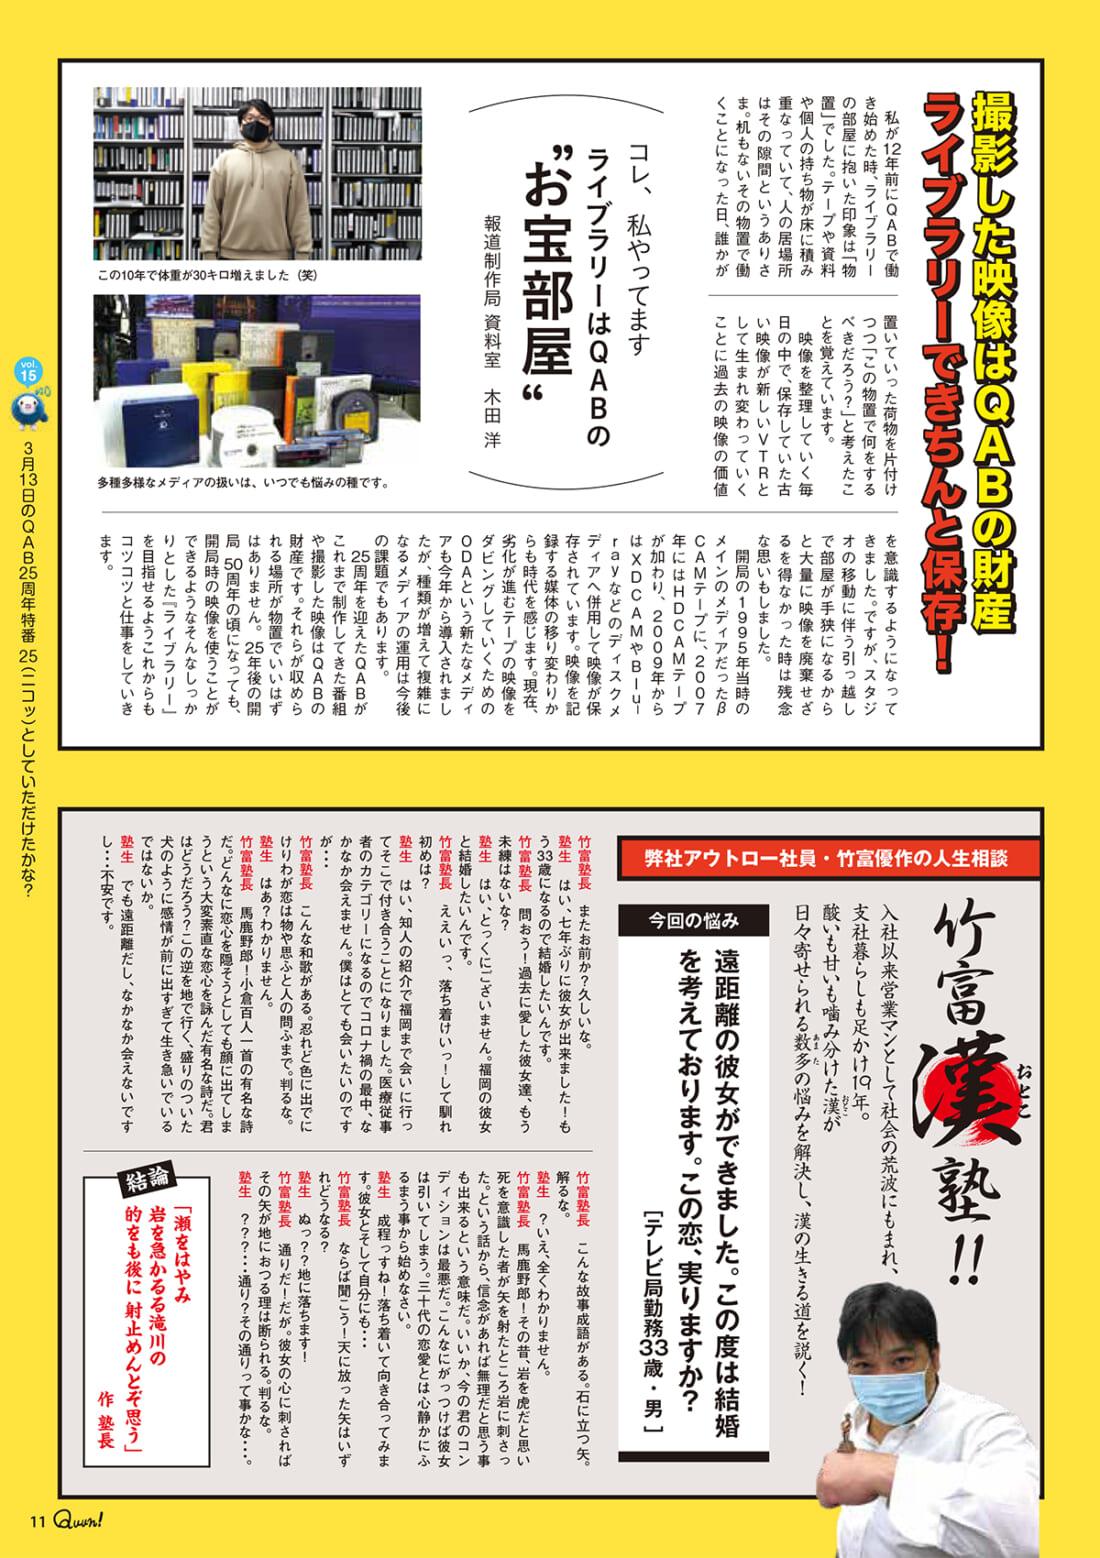 https://www.qab.co.jp/qgoro/wp-content/uploads/quun_1513-1100x1558.jpg